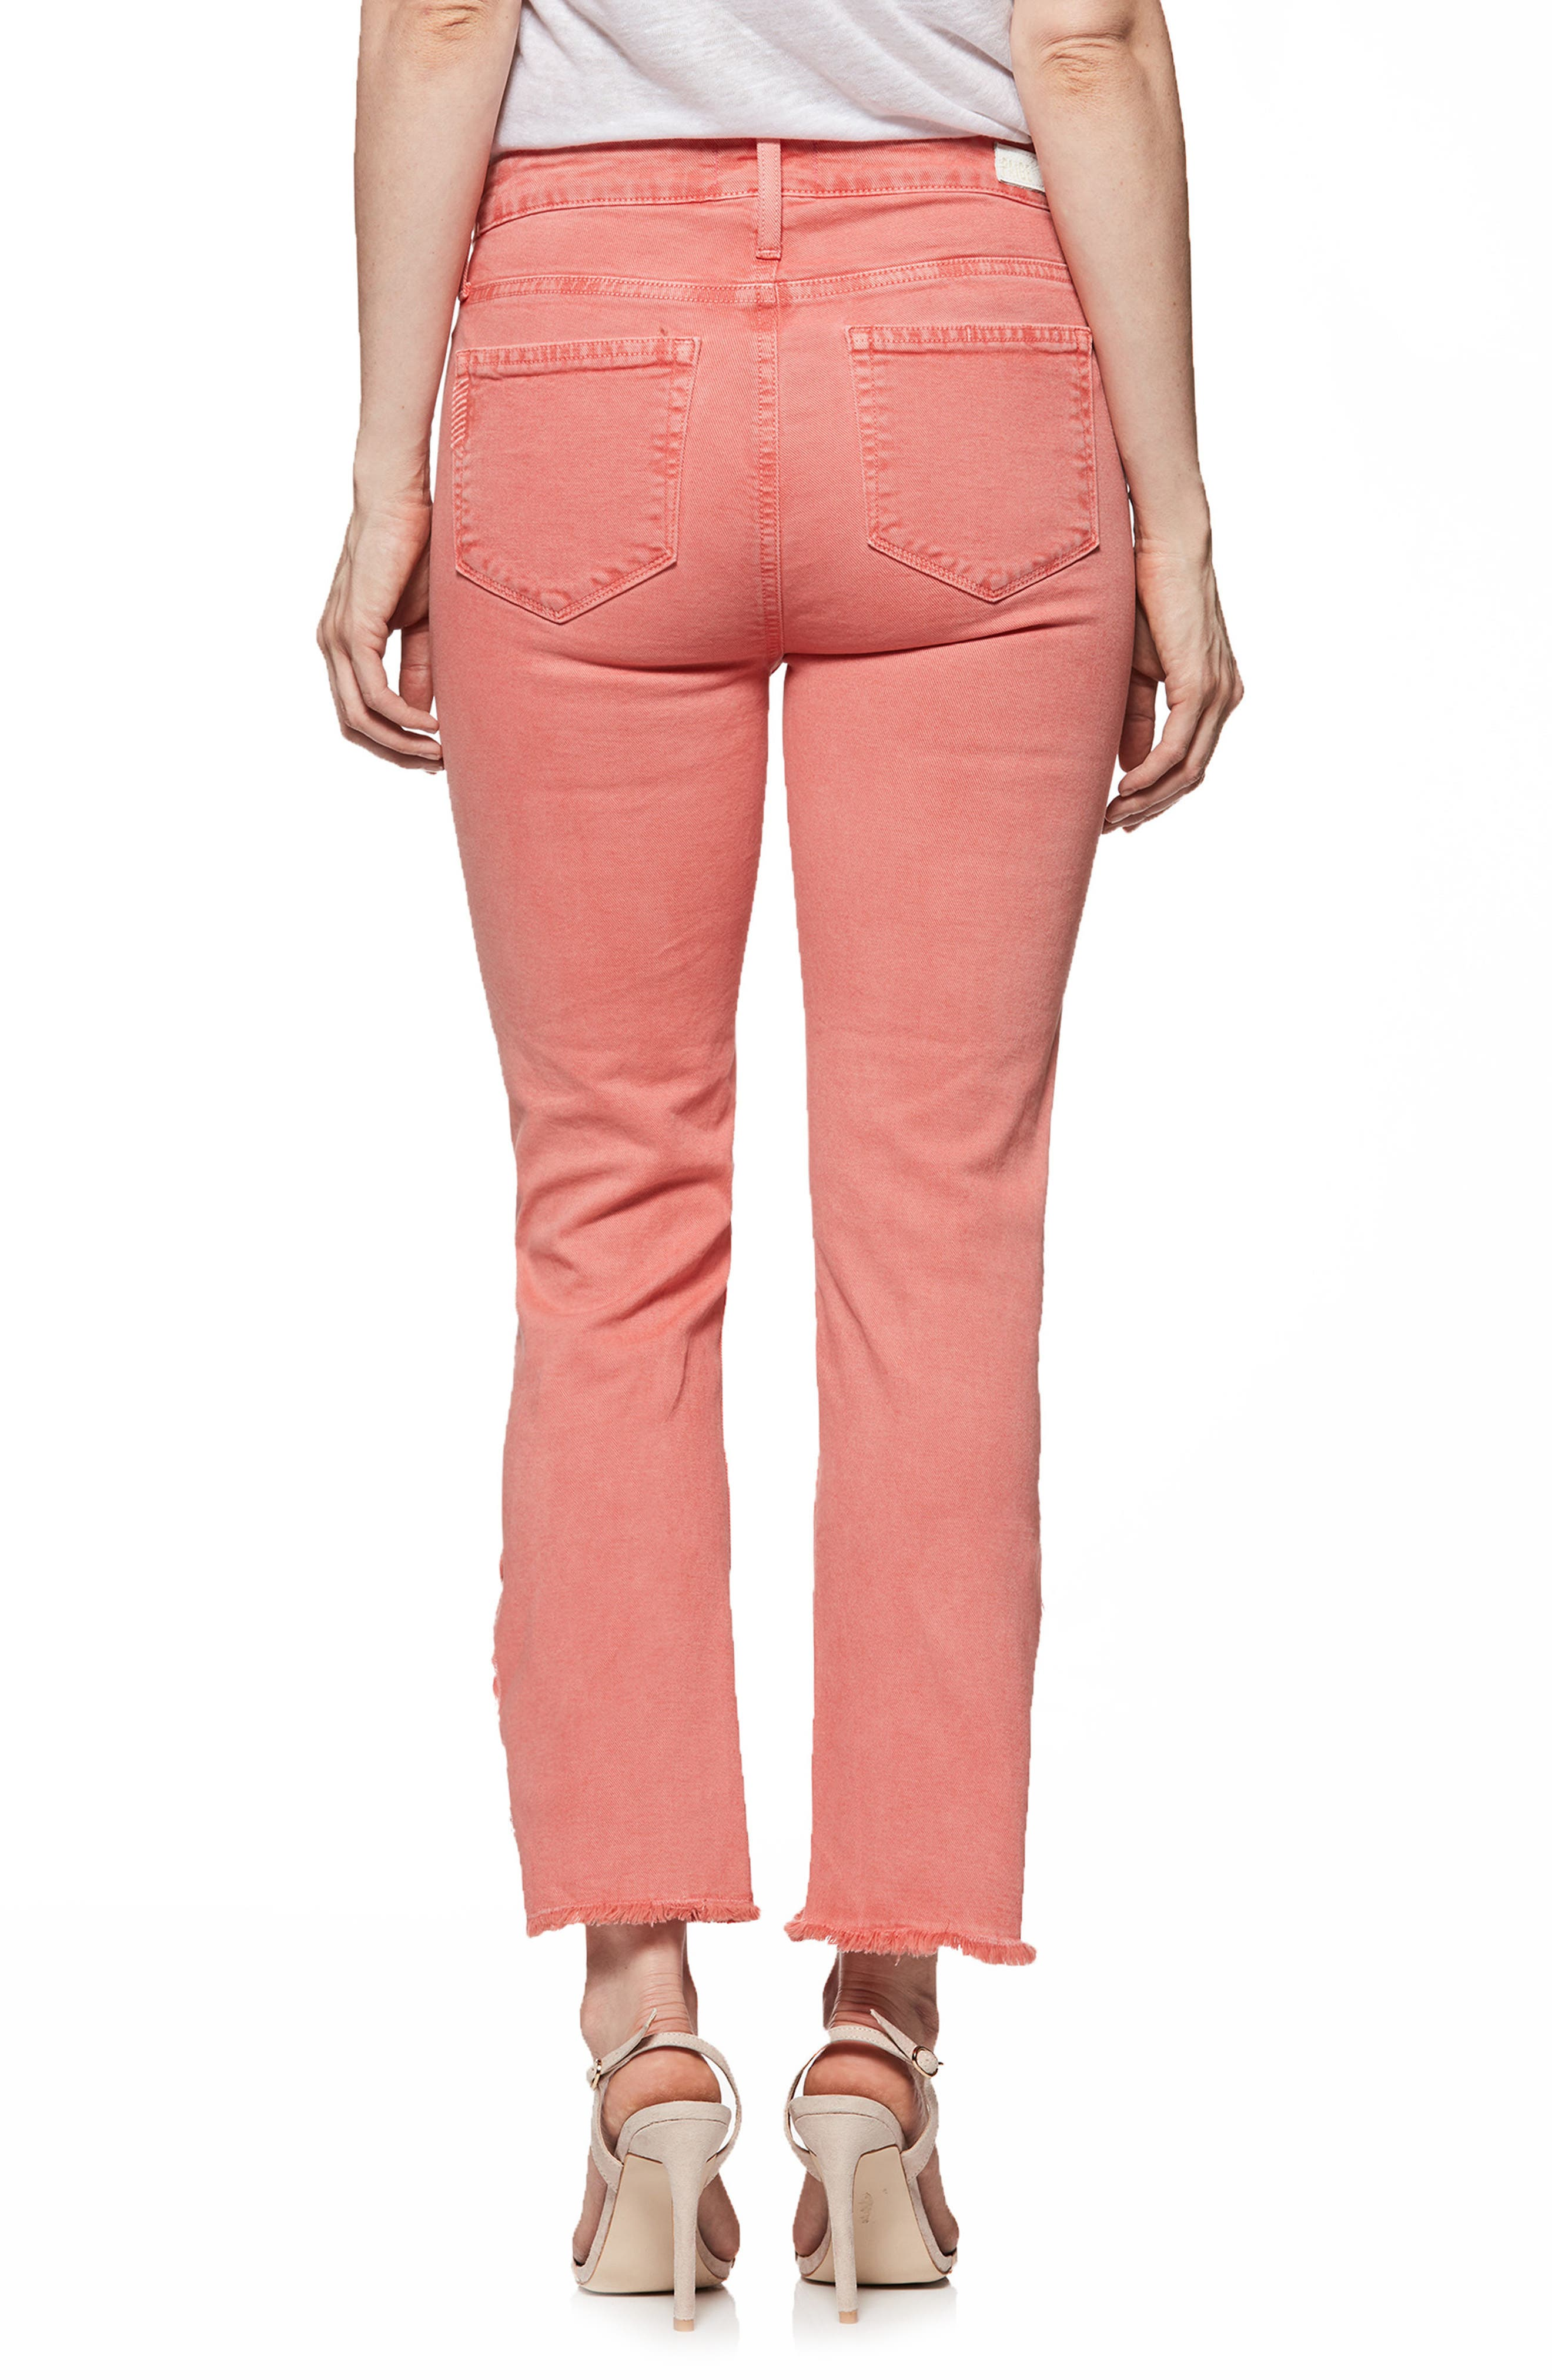 Hoxton High Waist Slit Hem Ankle Straight Jeans,                             Alternate thumbnail 2, color,                             Vintage Coral Reef